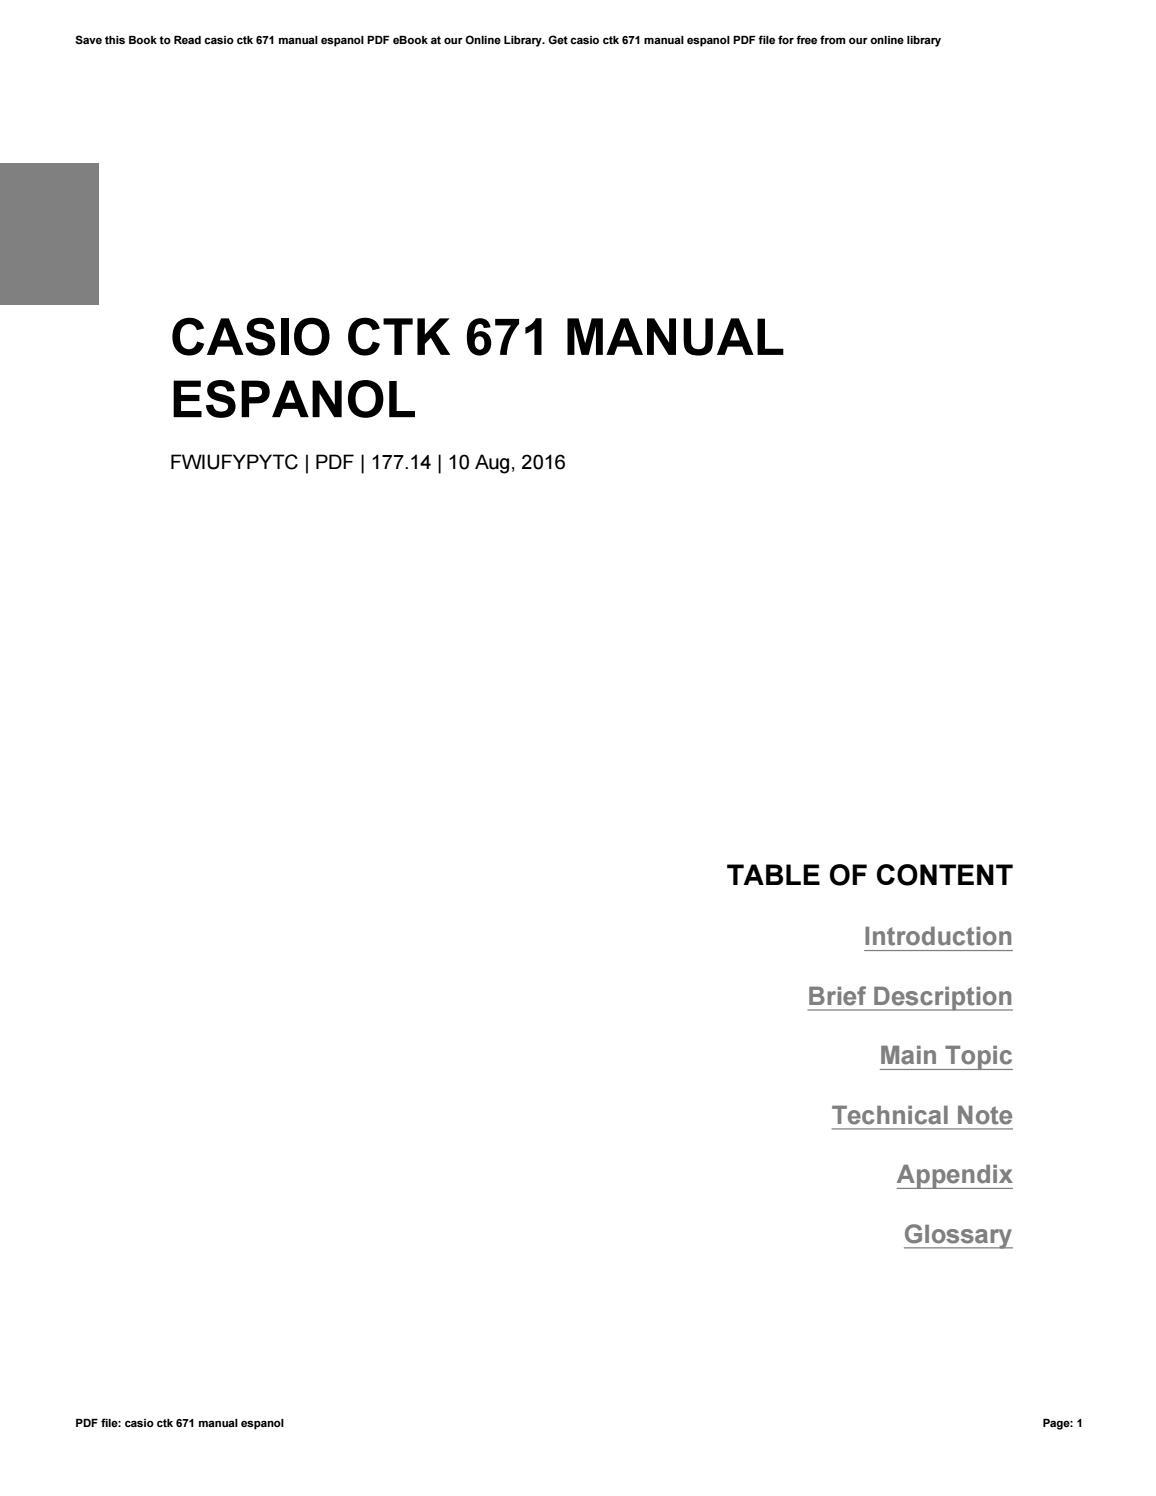 Casio Ctk 671 Manual Espanol By Mailfs55